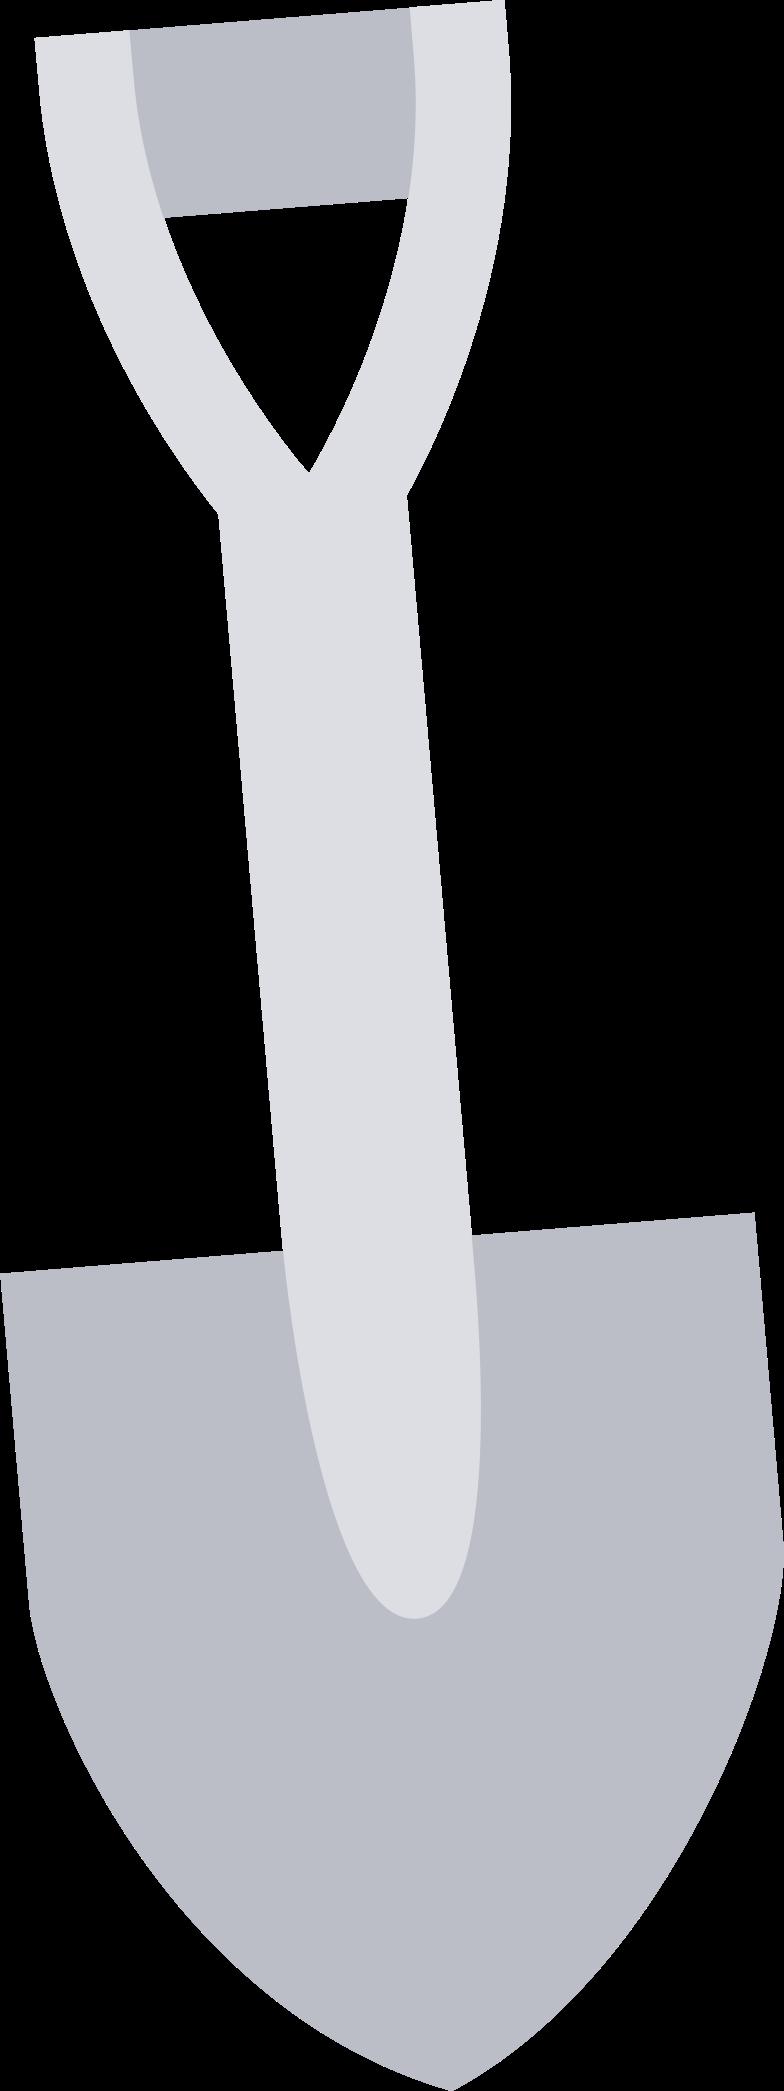 page under construction  shovel Clipart illustration in PNG, SVG